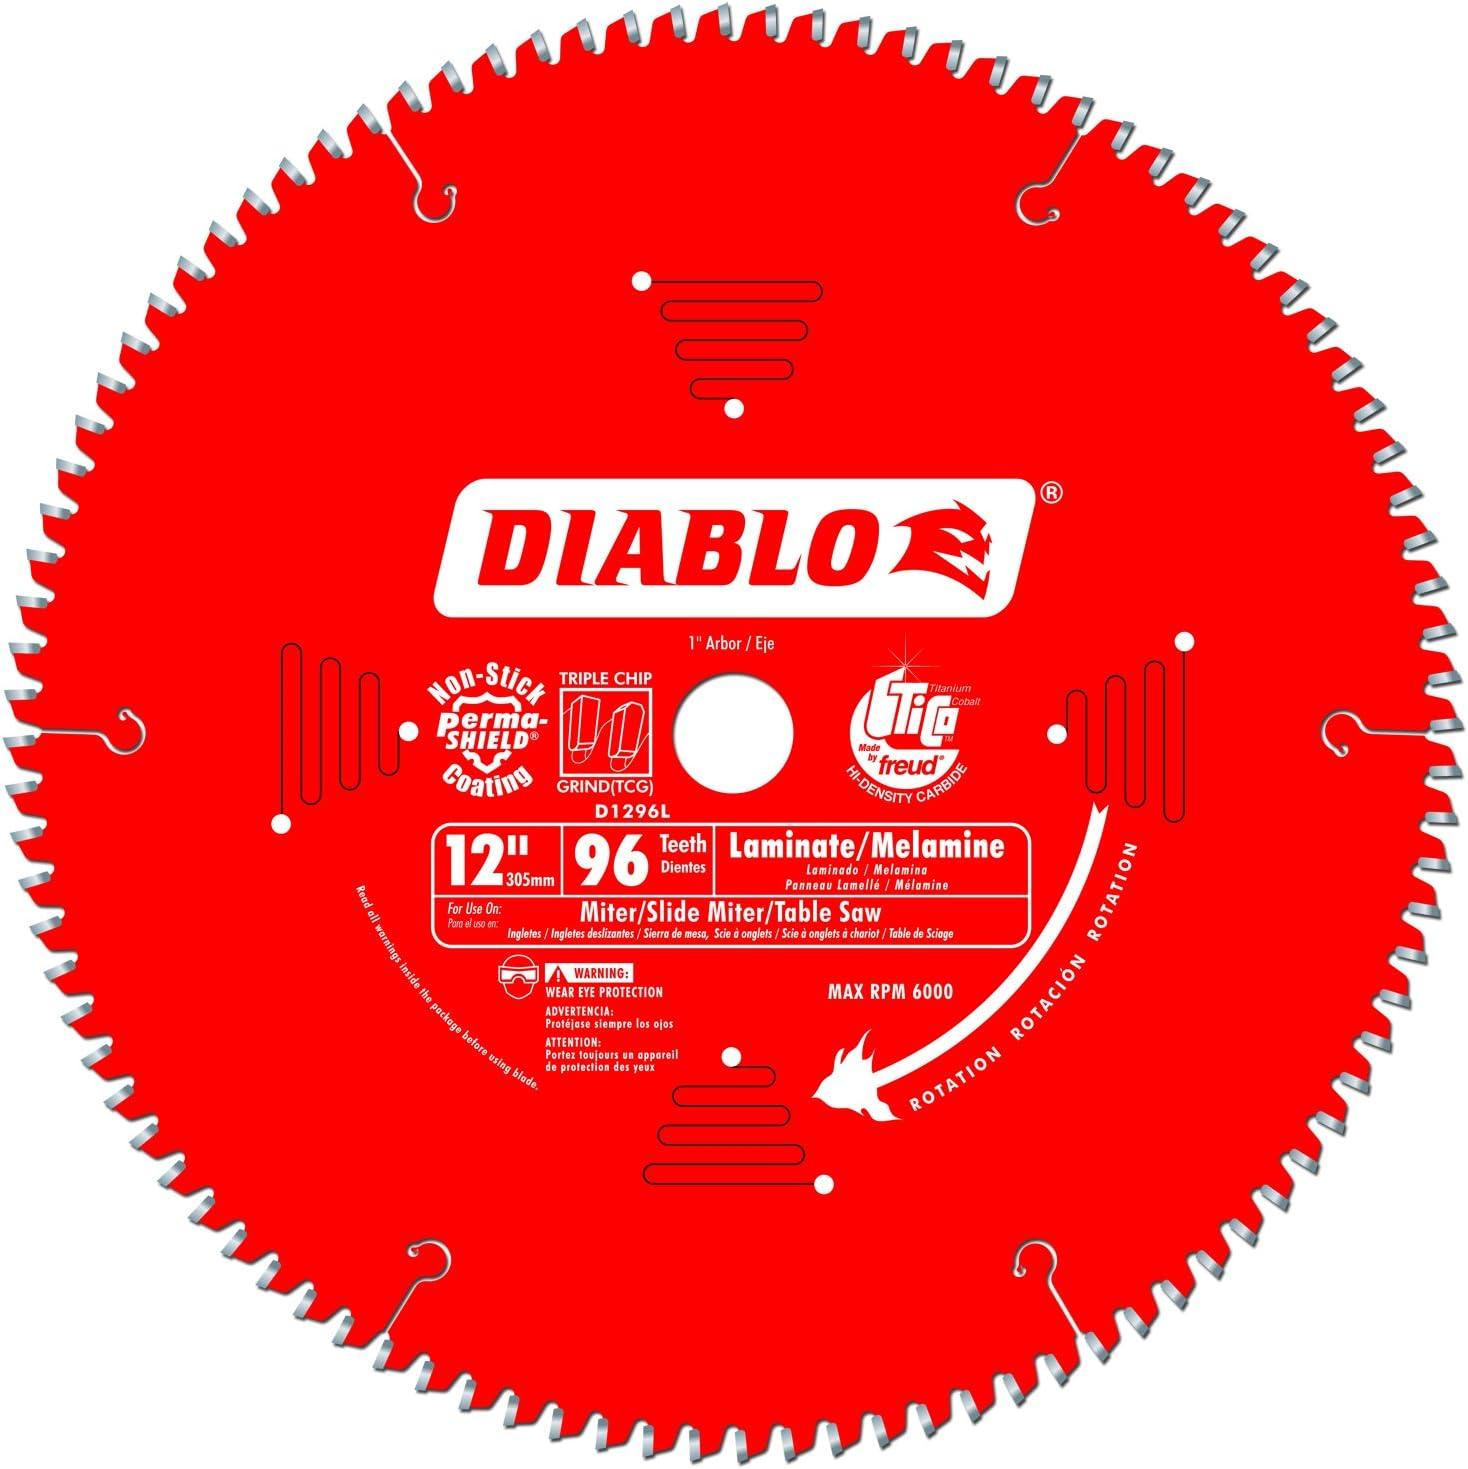 Freud D1296l Diablo Melamine Laminate Flooring And Wood Saw